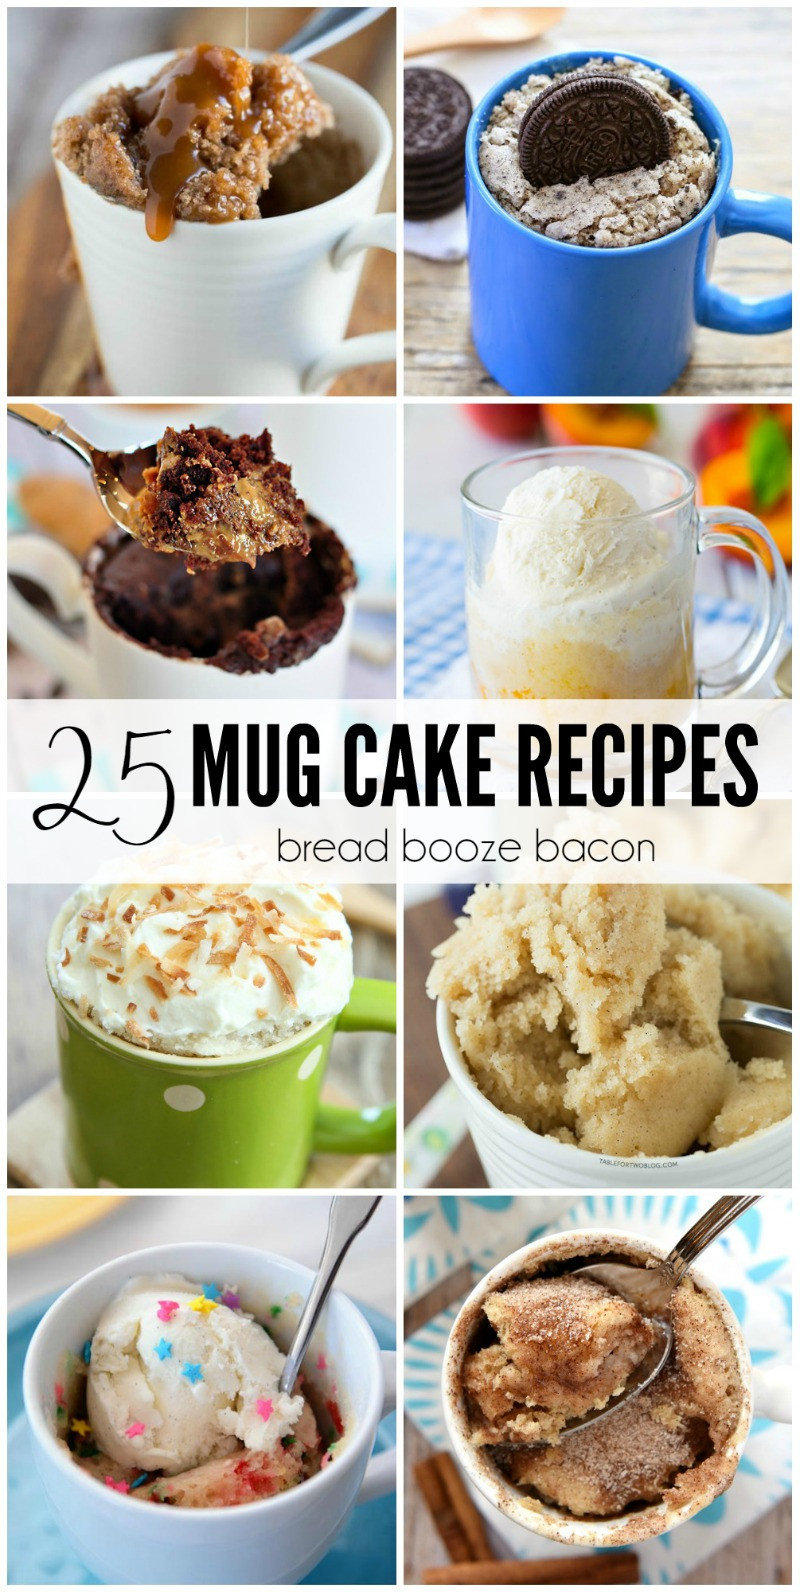 Healthy Mug Desserts  25 Mug Cake Recipes • Bread Booze Bacon